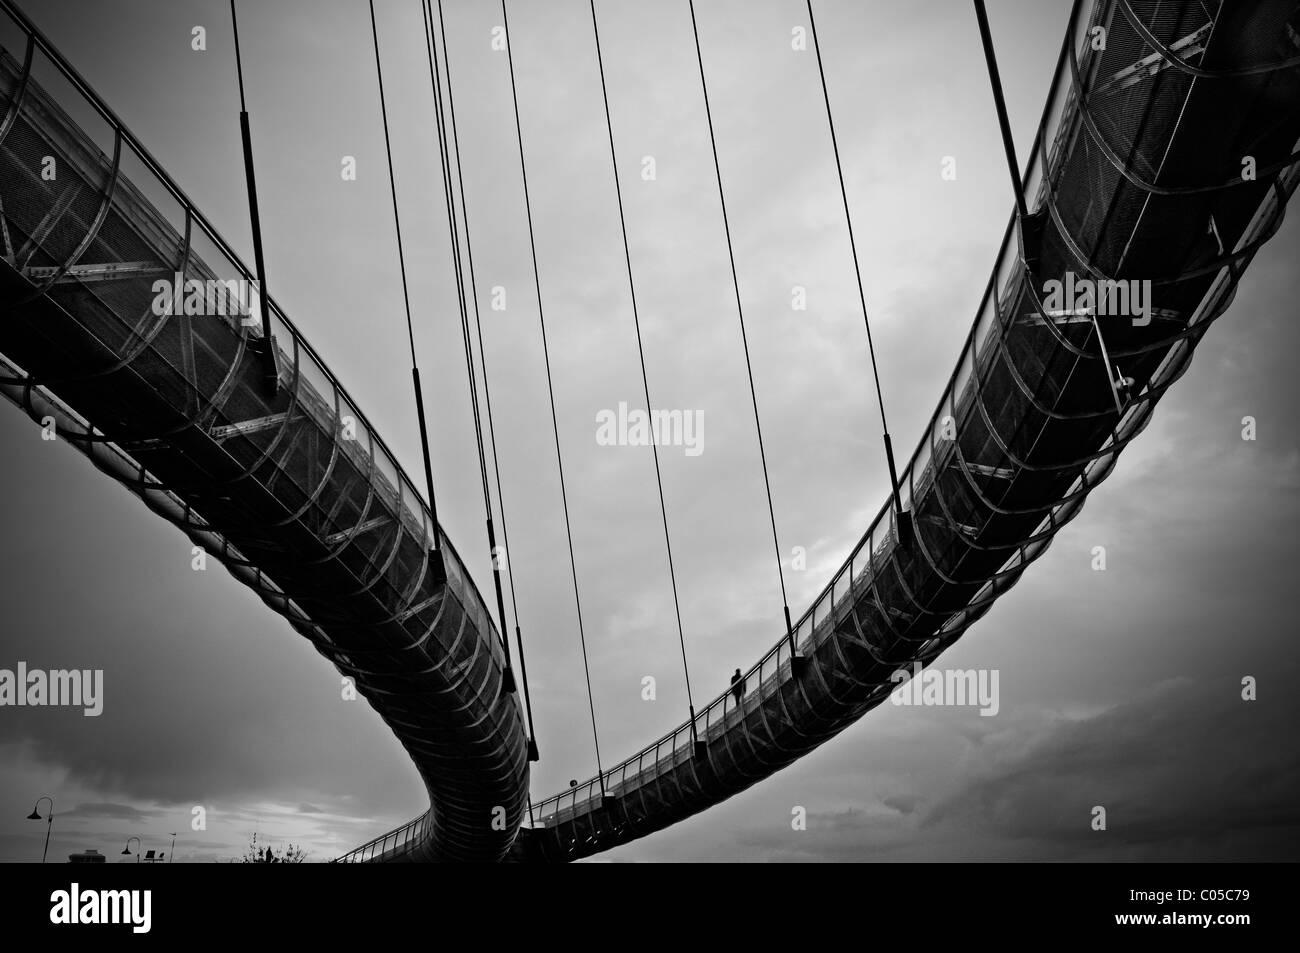 Cable bridge - Stock Image